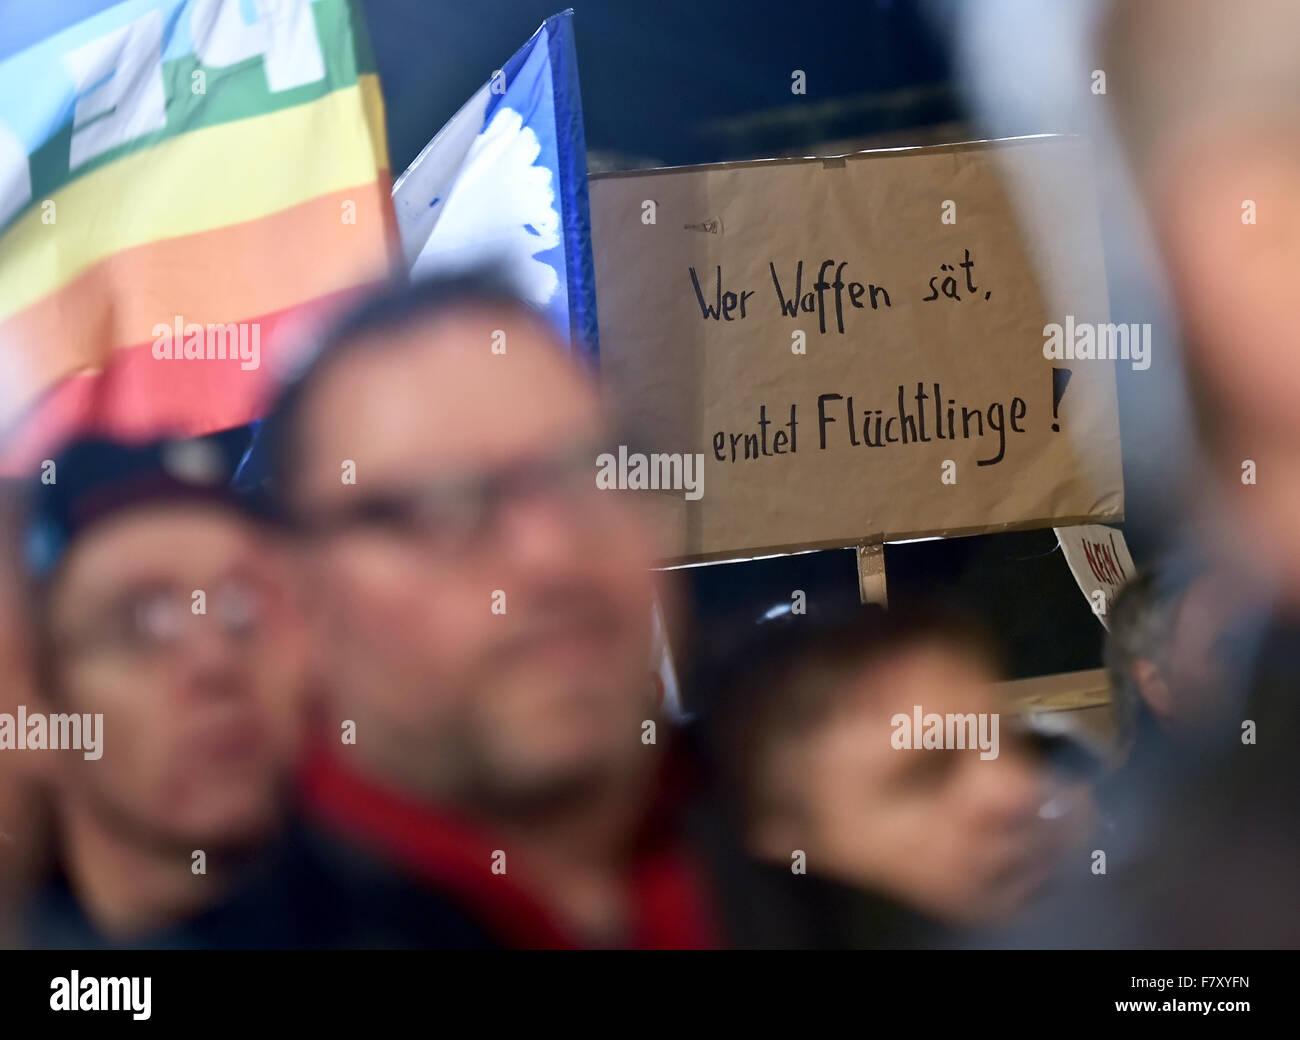 "Berlin, Germany. 3rd Dec, 2015. A demonstrator holds a sign that reads ""Wer Waffen saet, erntet Fluechtlinge!"" (lit. Stock Photo"